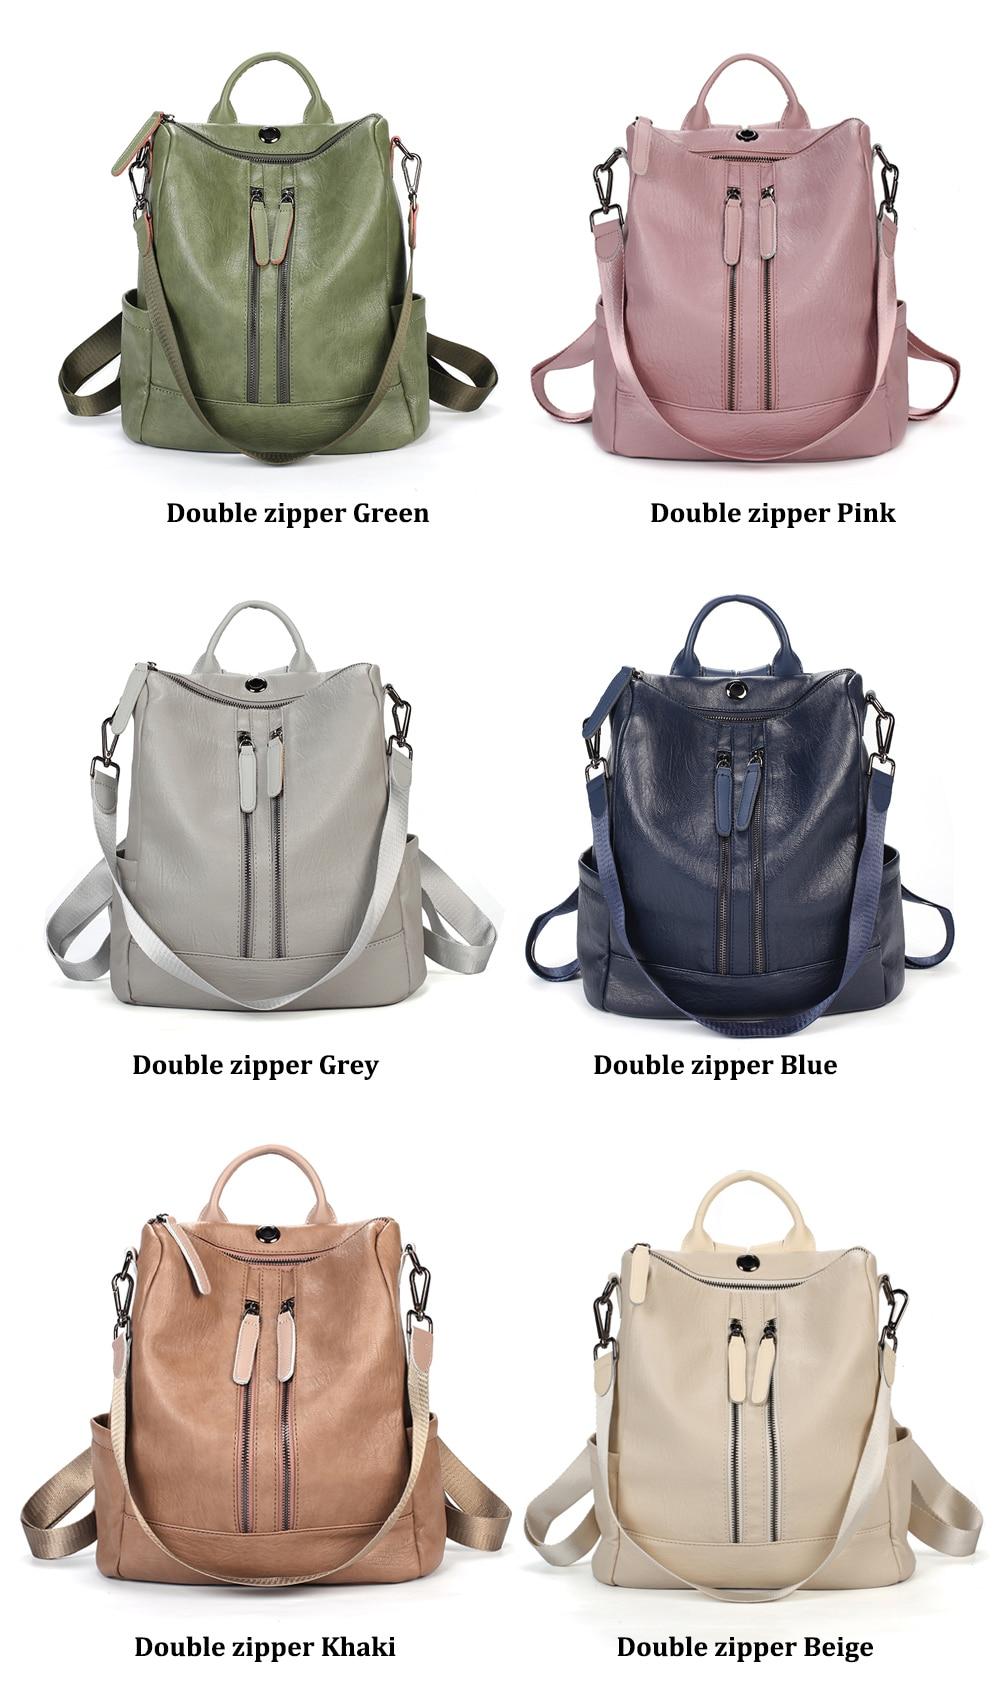 Hea7e219a034d45e8a7e5efe199983adf3 Female backpack mochila feminina casual Multifunction Women Leather Backpack Female Shoulder Bag Sac A Dos Travel Back Pack